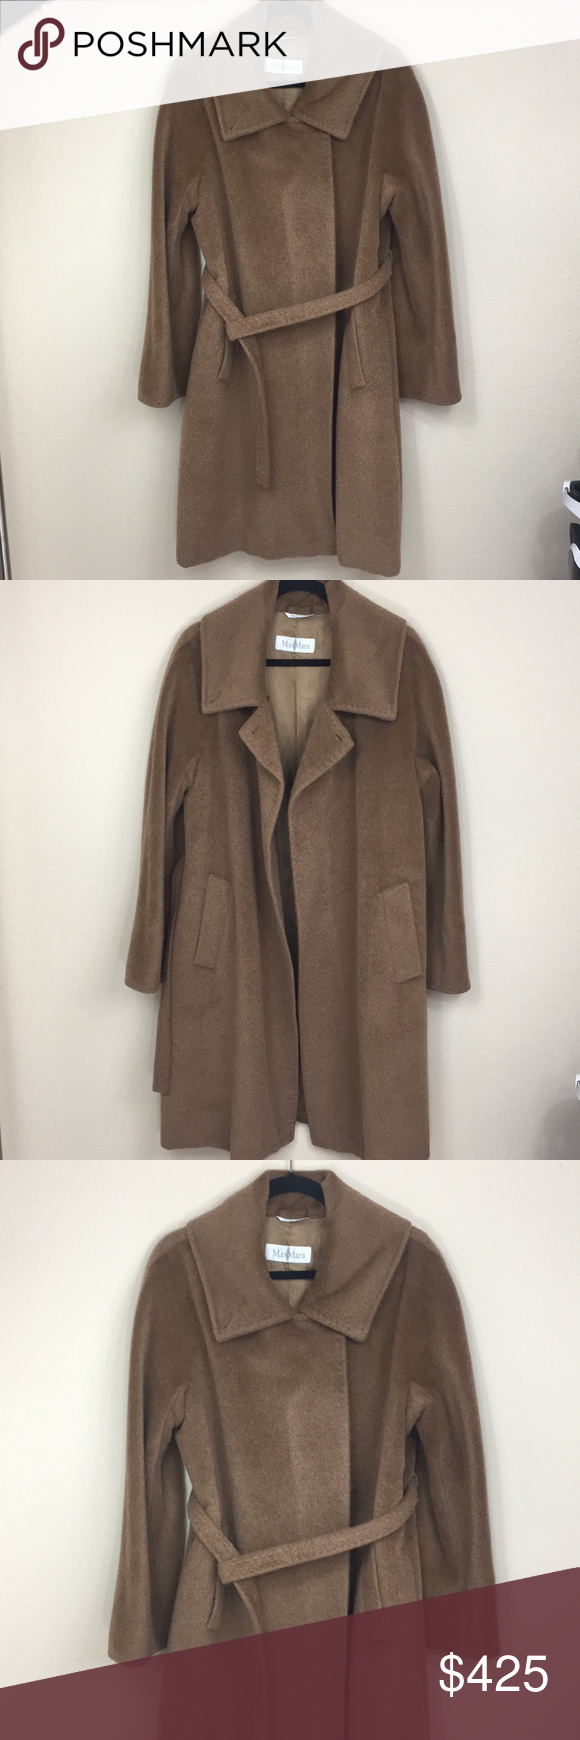 MaxMara Wool & Alpaca Cozy Belted Camel Coat MaxMara. Camel/brown color wool and…